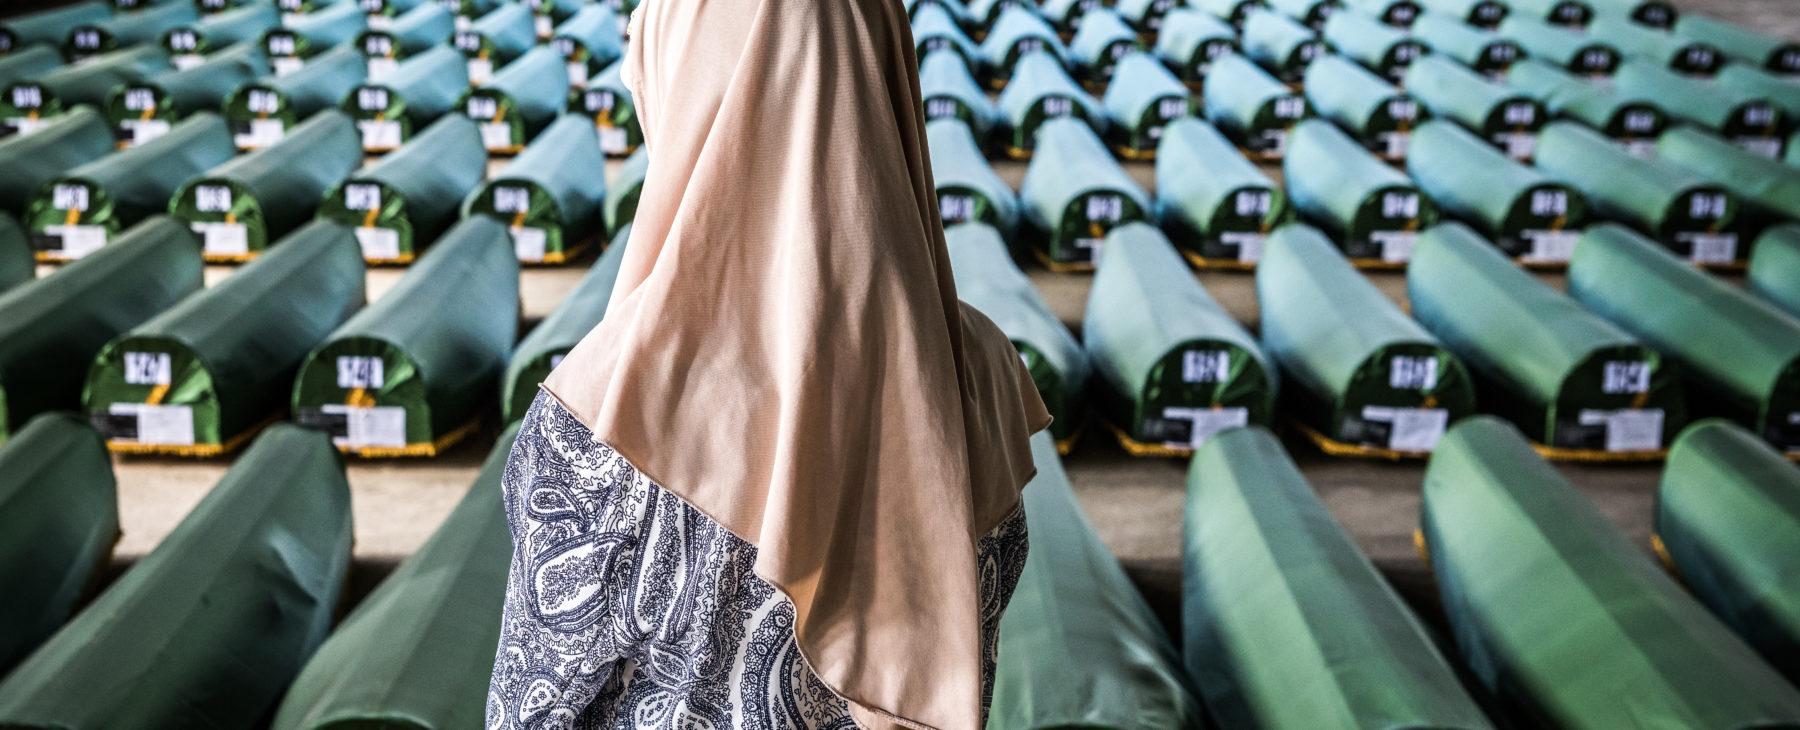 BiH: Indictment of war suspect rekindles hope for rape victim